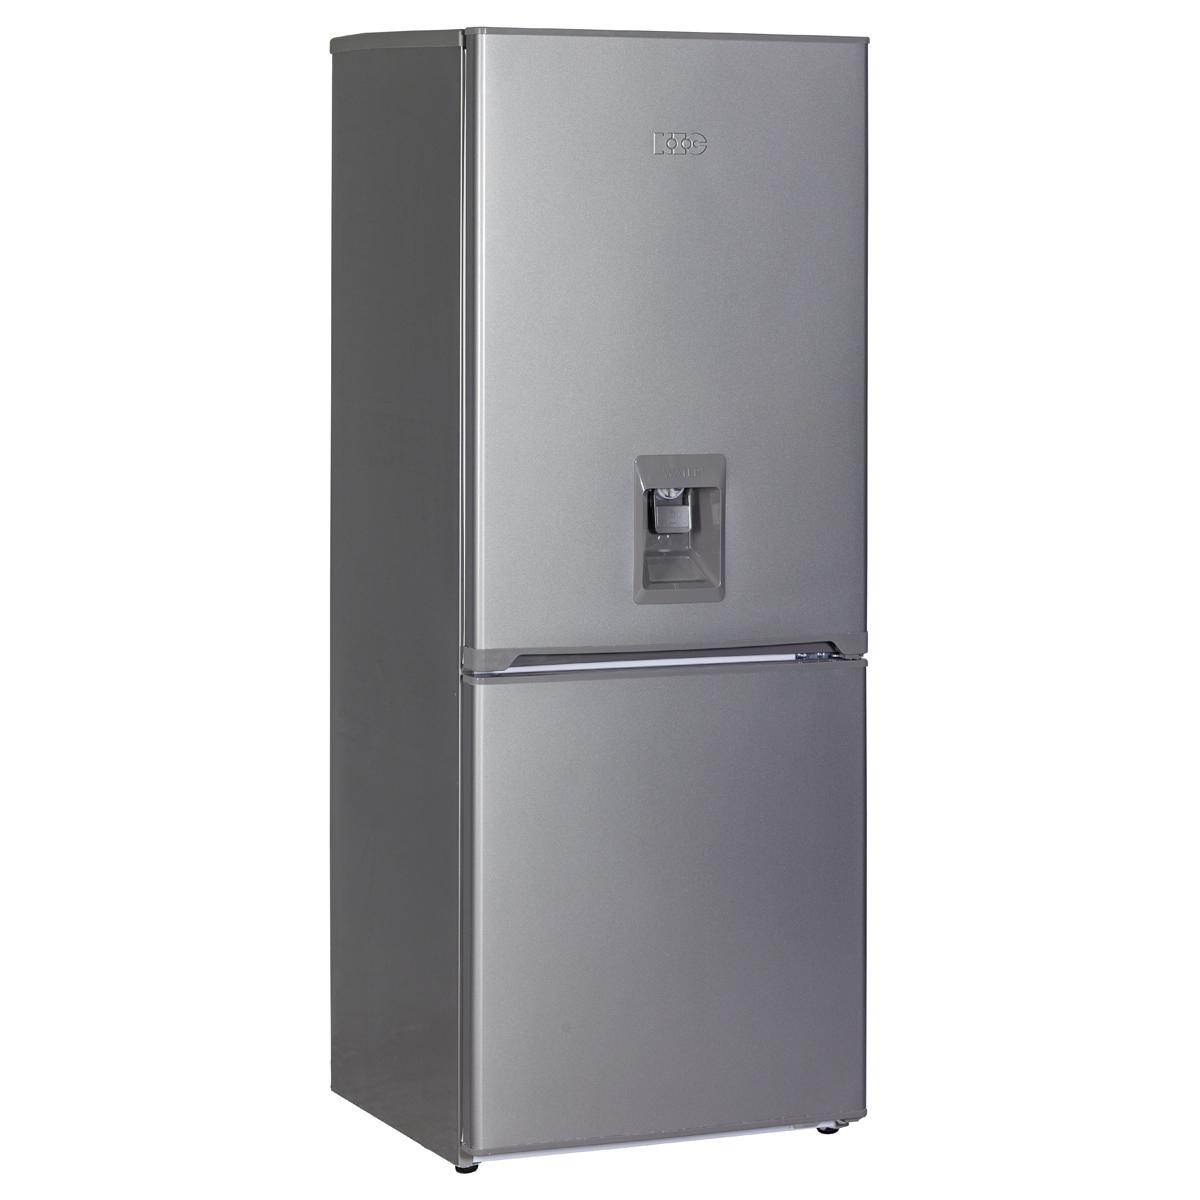 Kic Kbf630 1me Wd 276l Bottom Freezer Combi Refrigerator